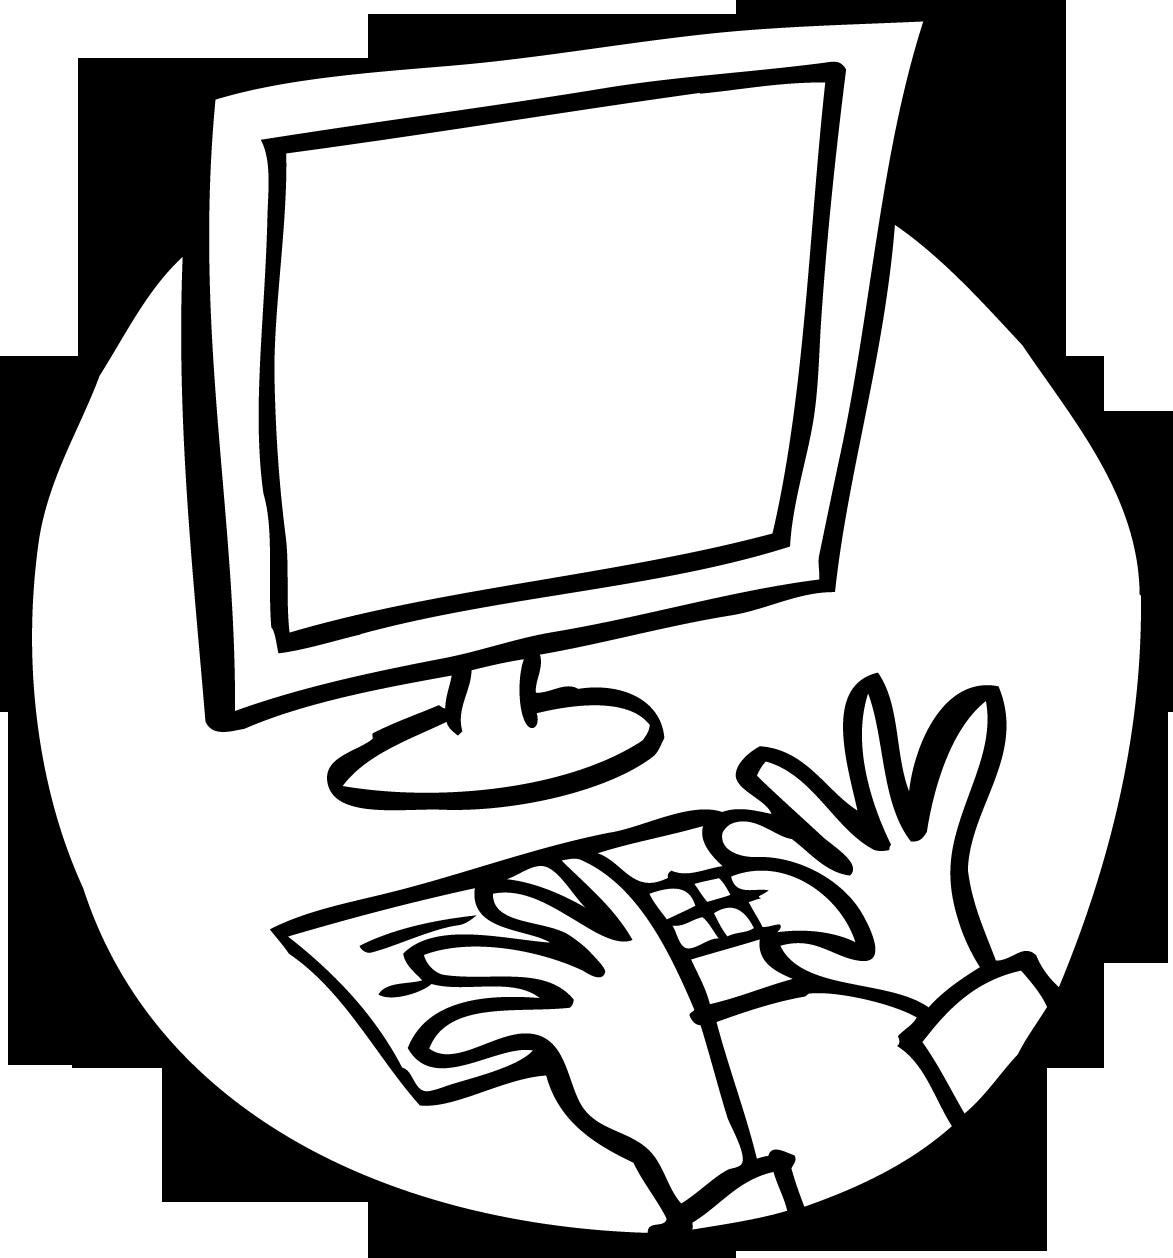 Keyboard and screen in use